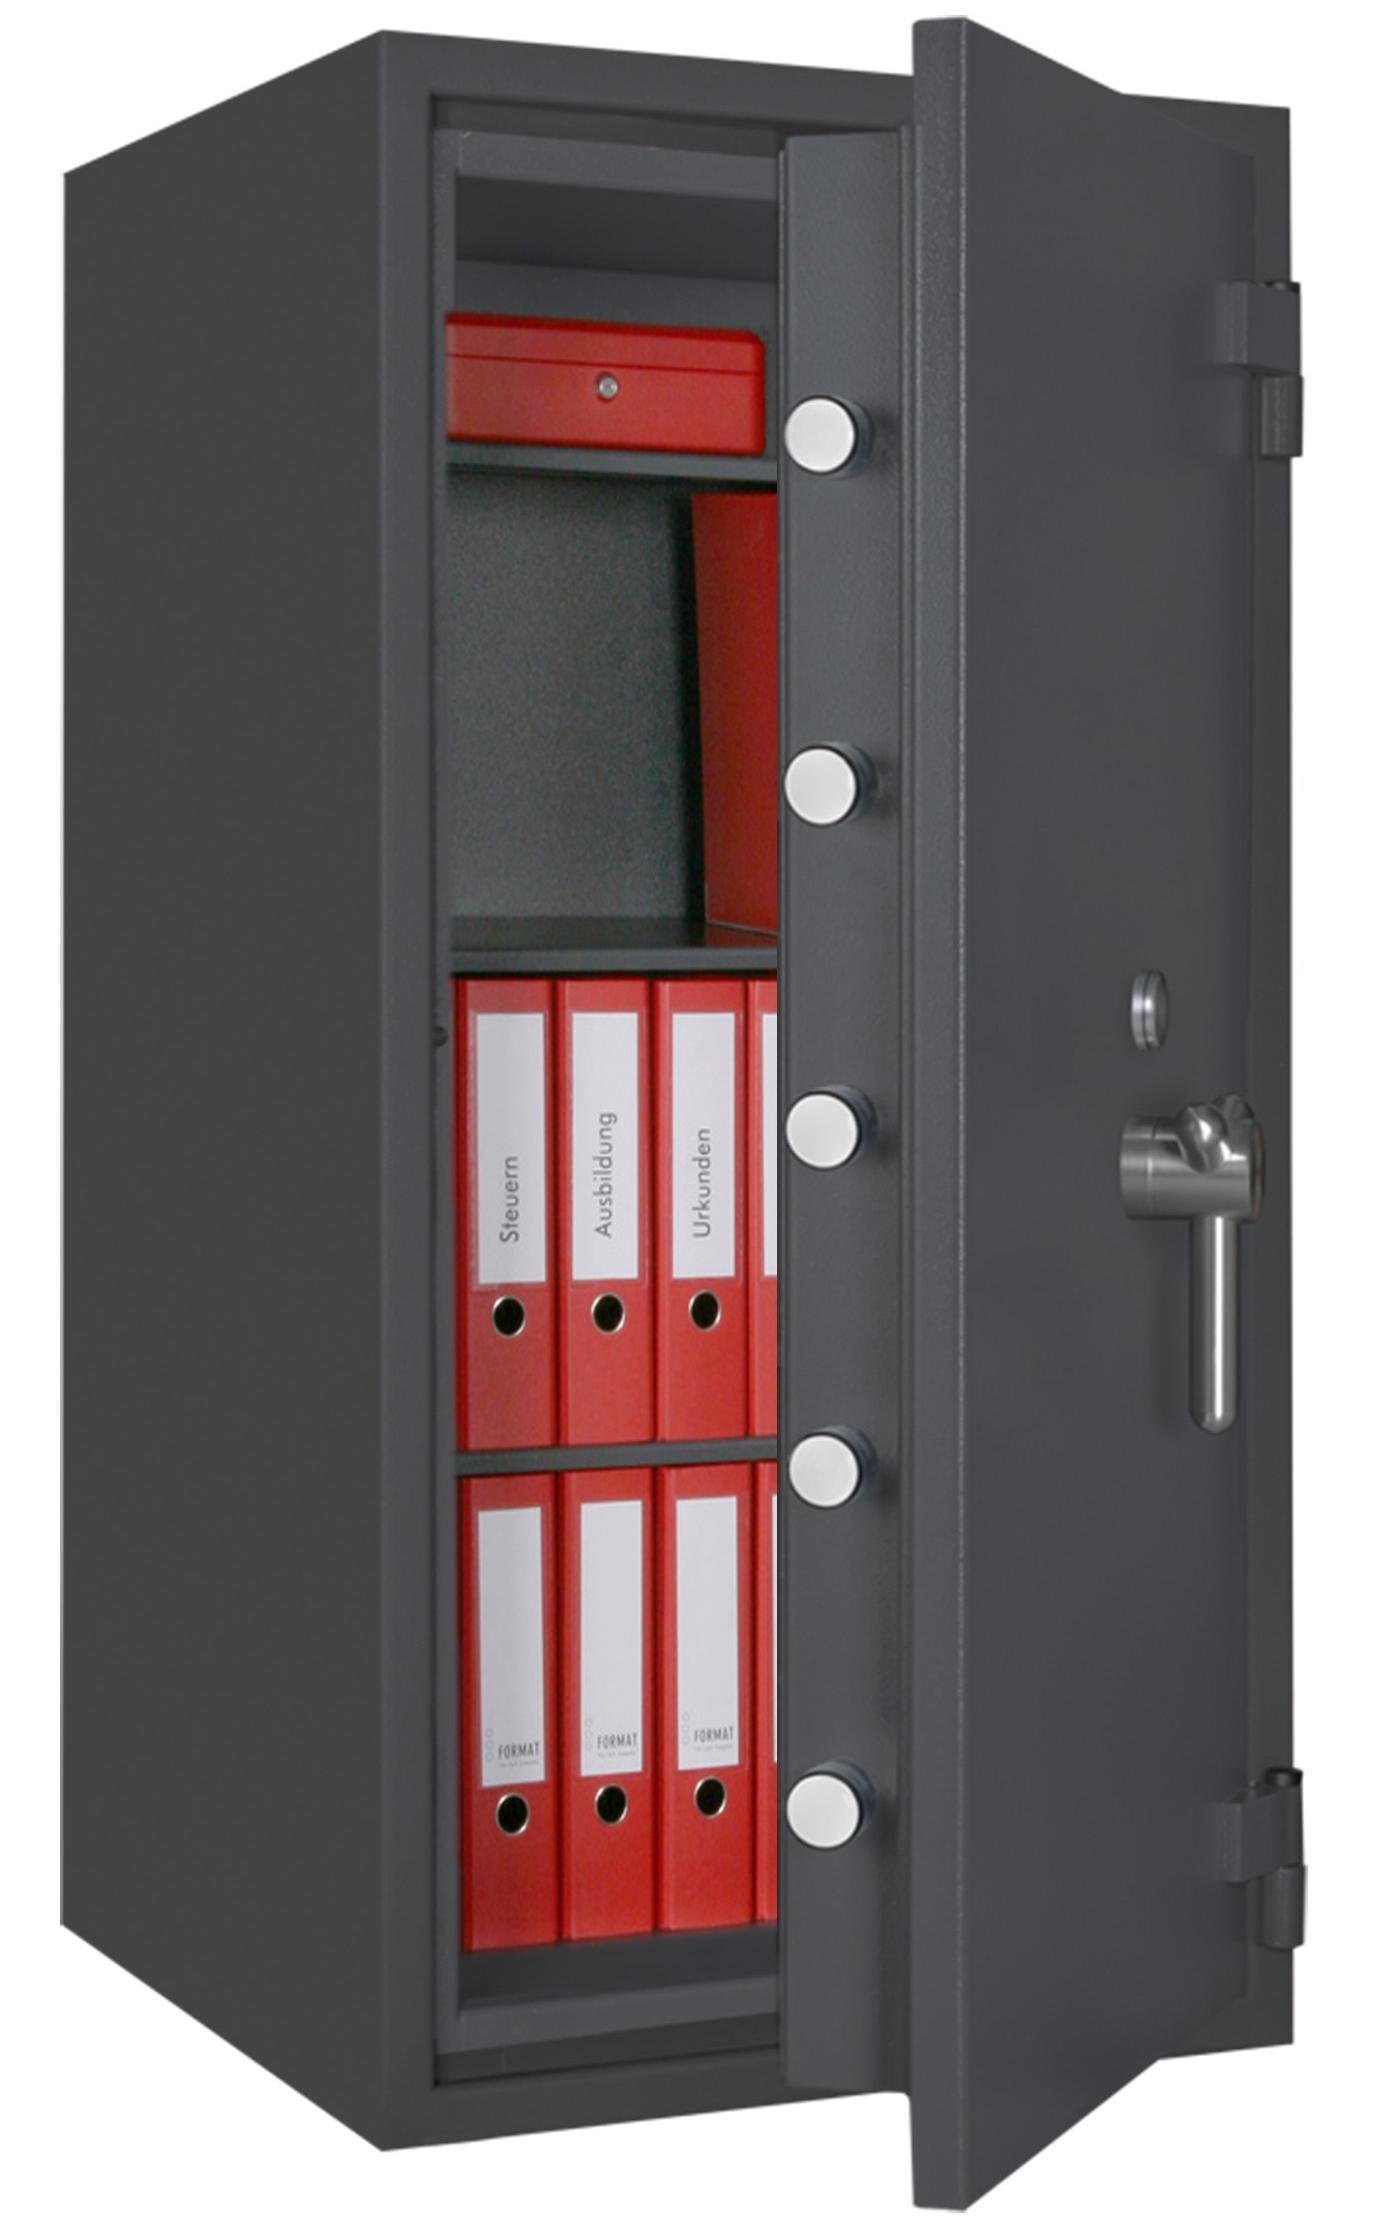 format wertschutzresor rubin pro 60 tresor vds klasse 3 widerstandsgrad en 1143 1. Black Bedroom Furniture Sets. Home Design Ideas